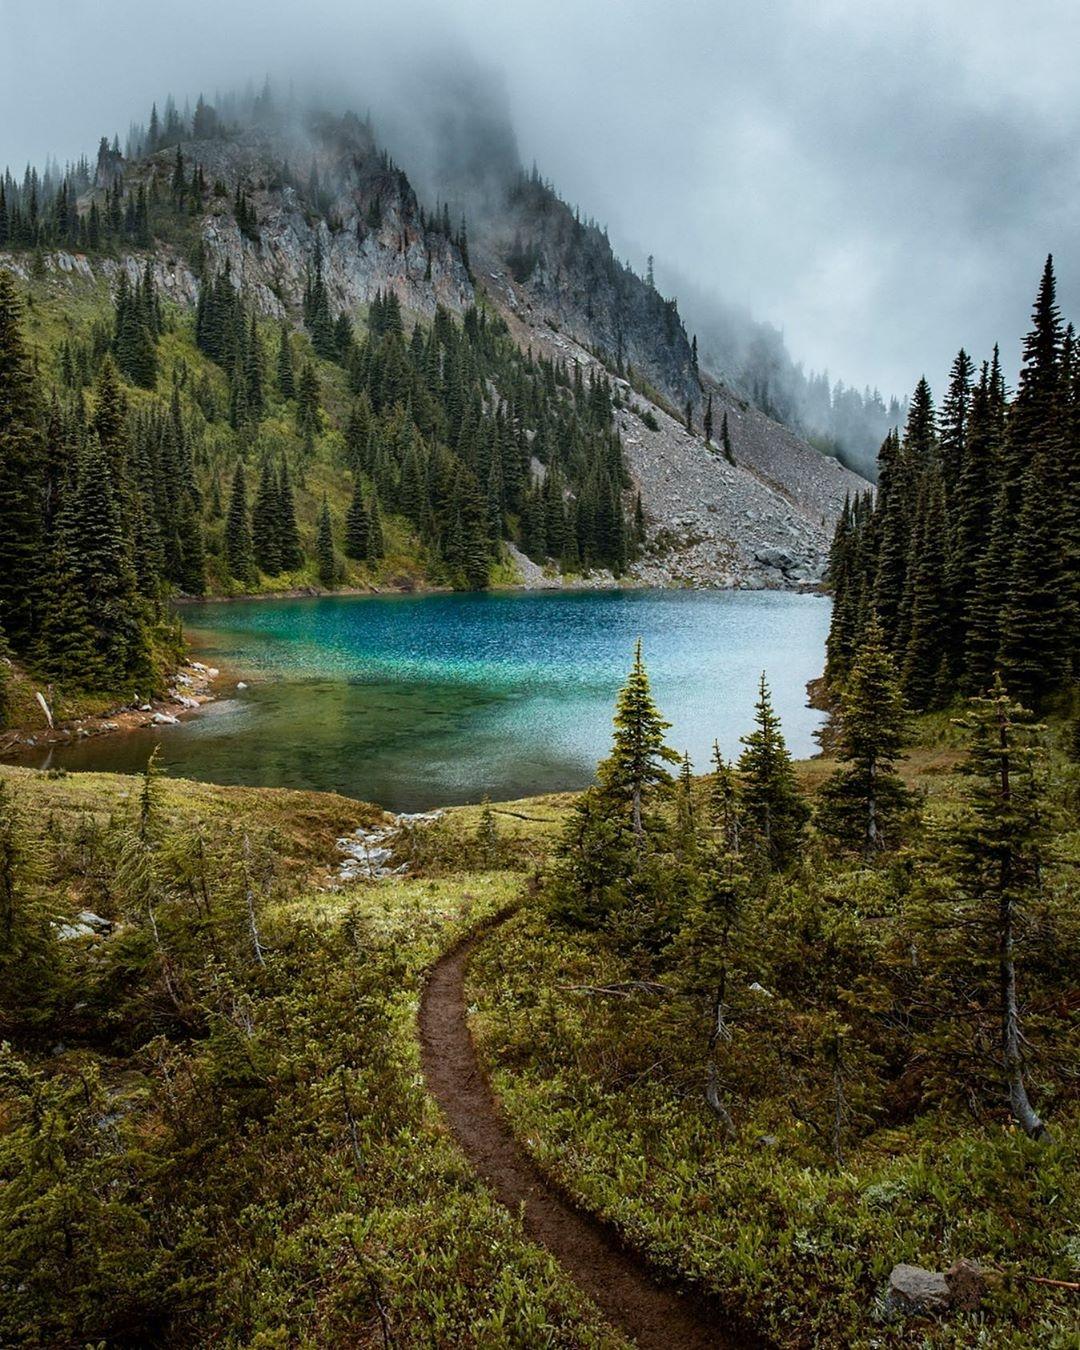 Ranier National Park